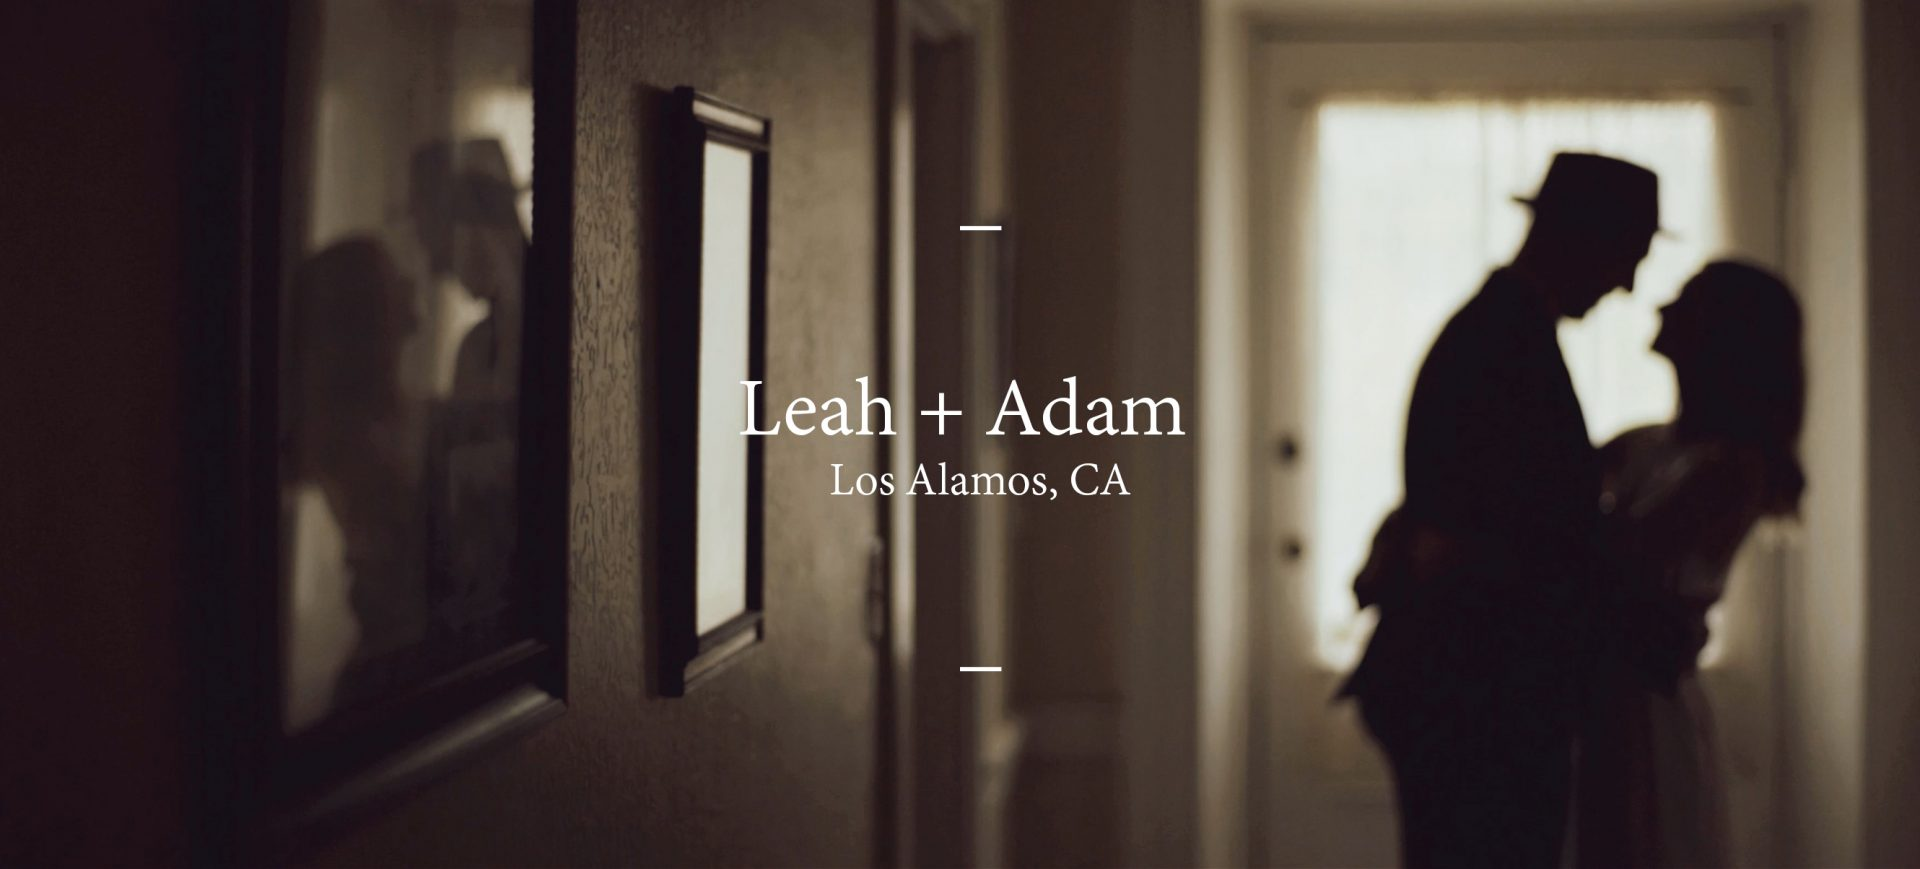 Leah + Adam | Los Alamos, California